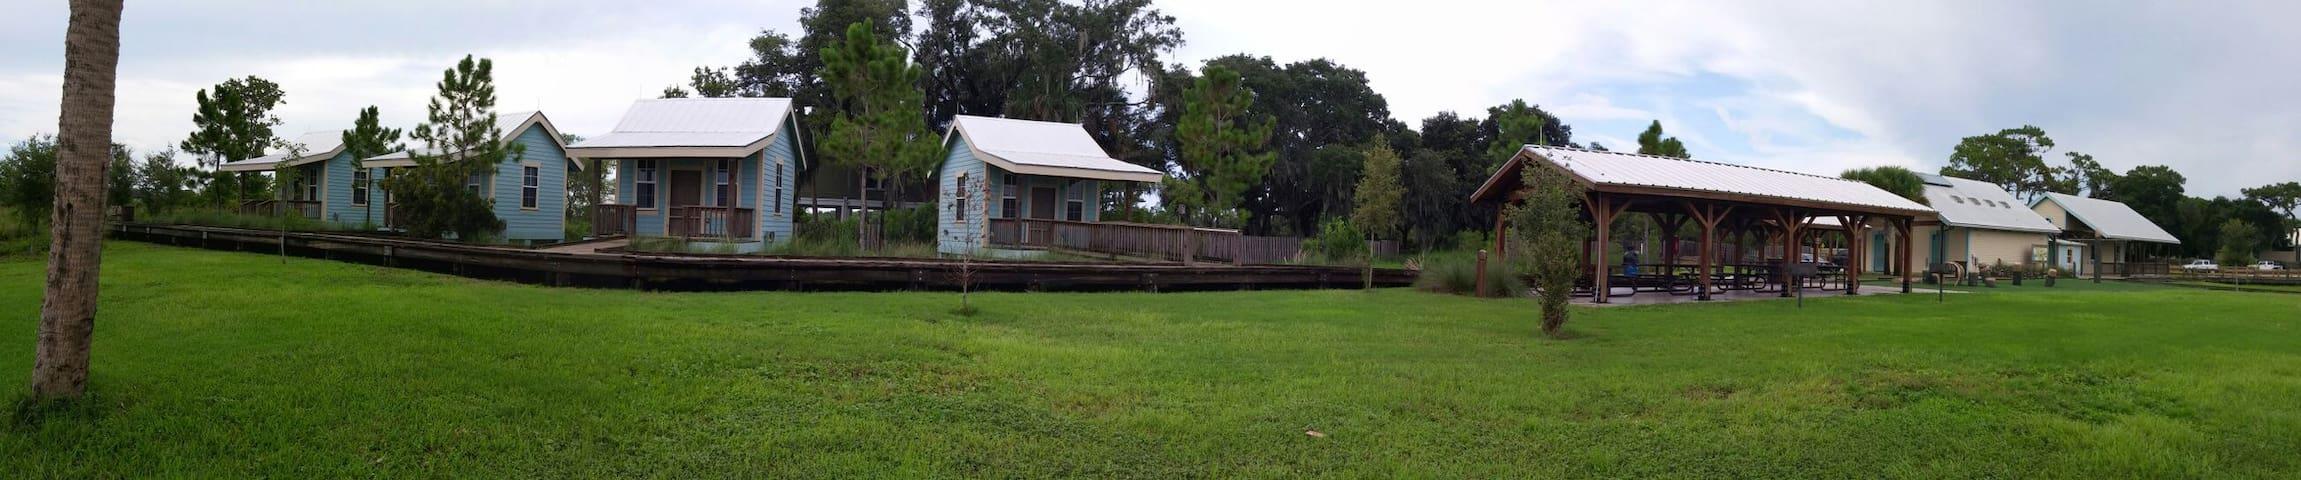 Jiggs Landing- Lakeside cabins - Bradenton